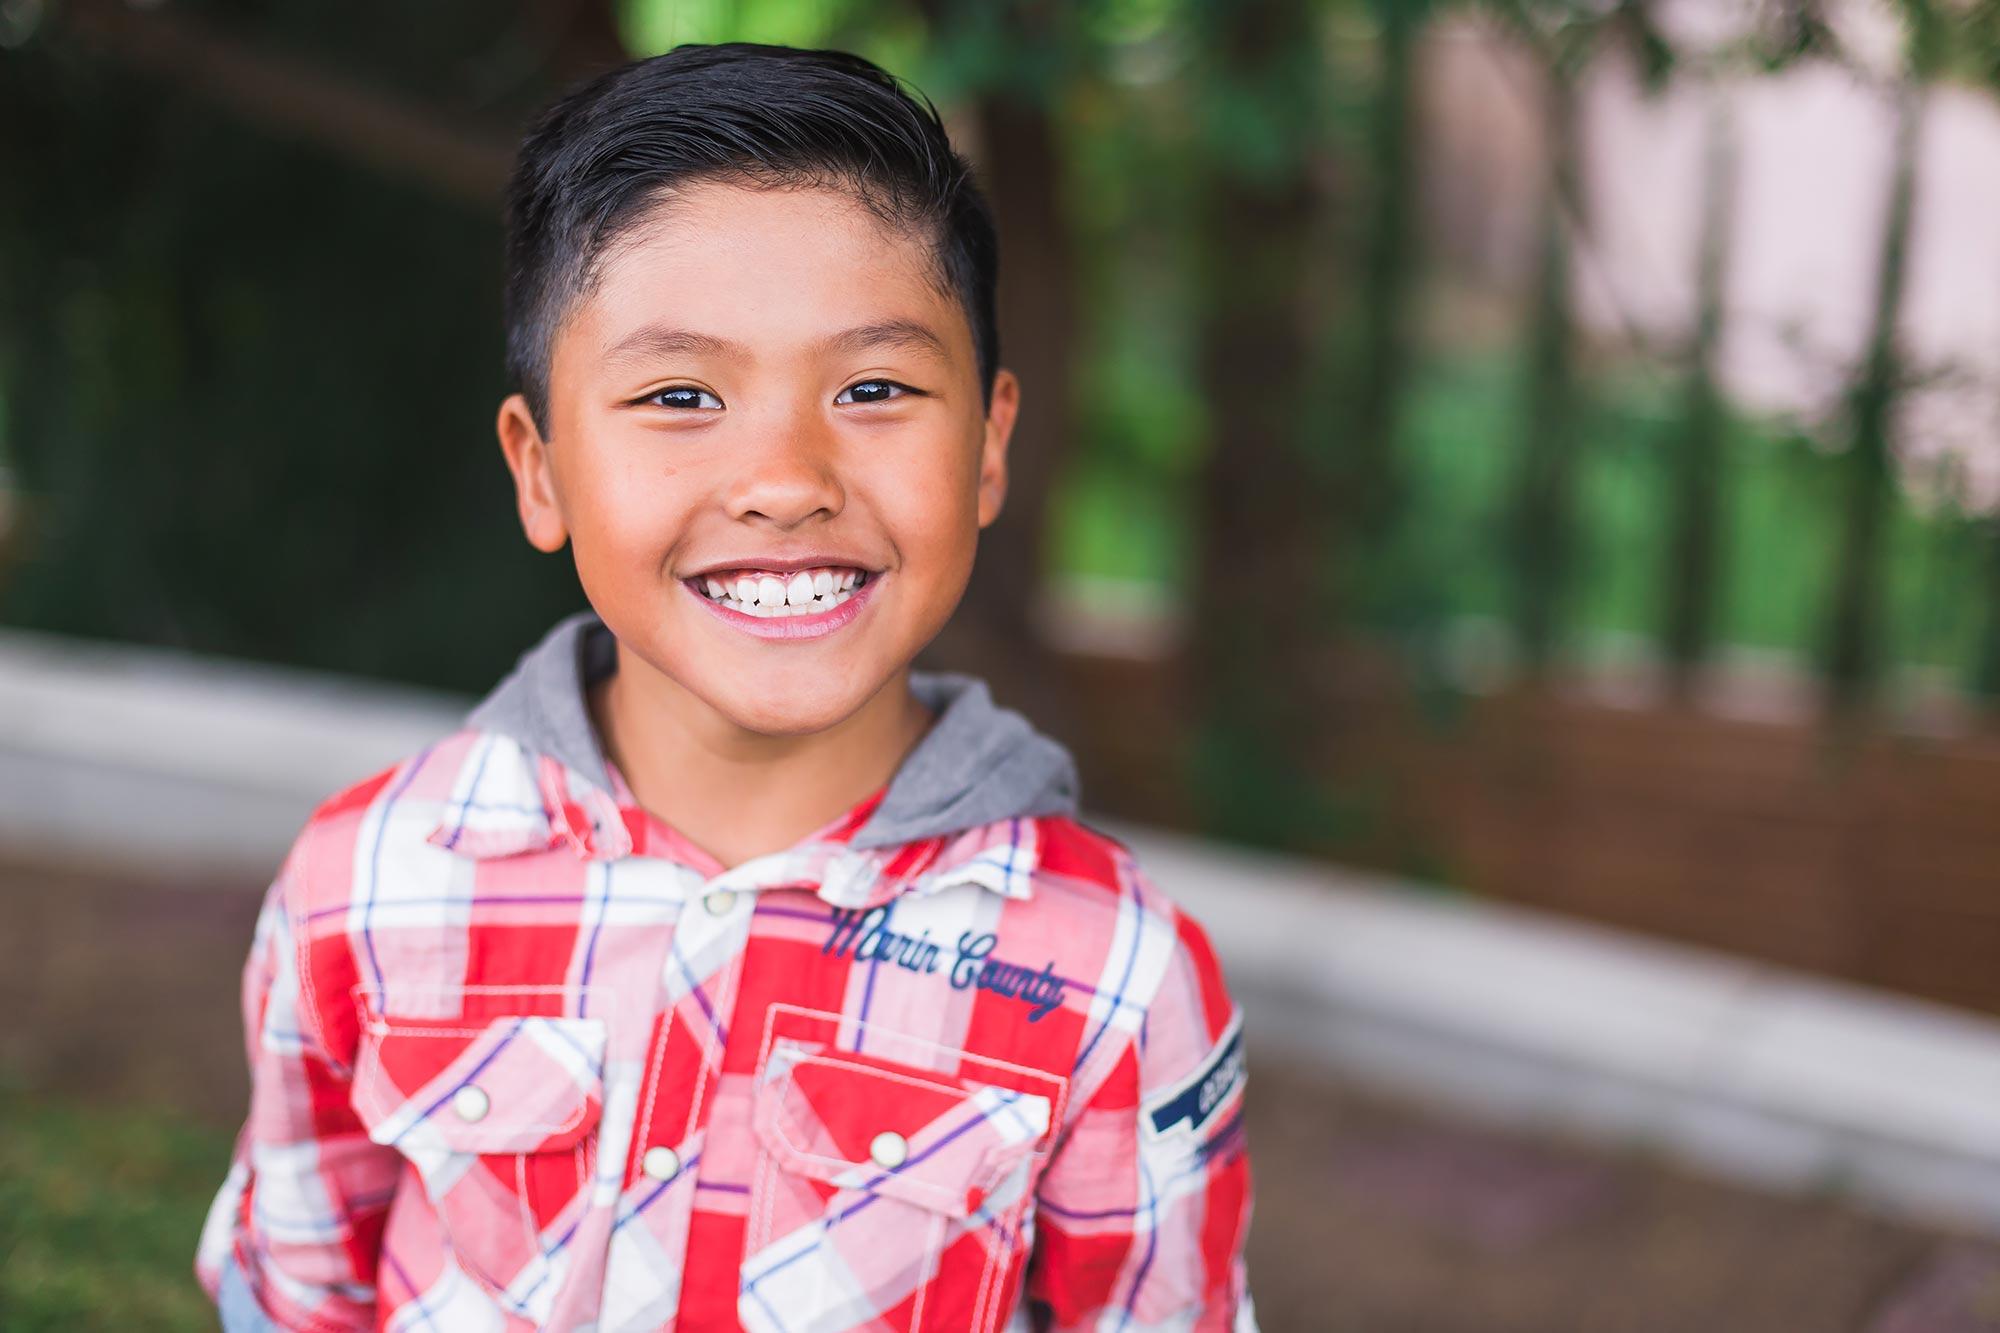 Danvers Children's Birthday Photographer   Stephen Grant Photography